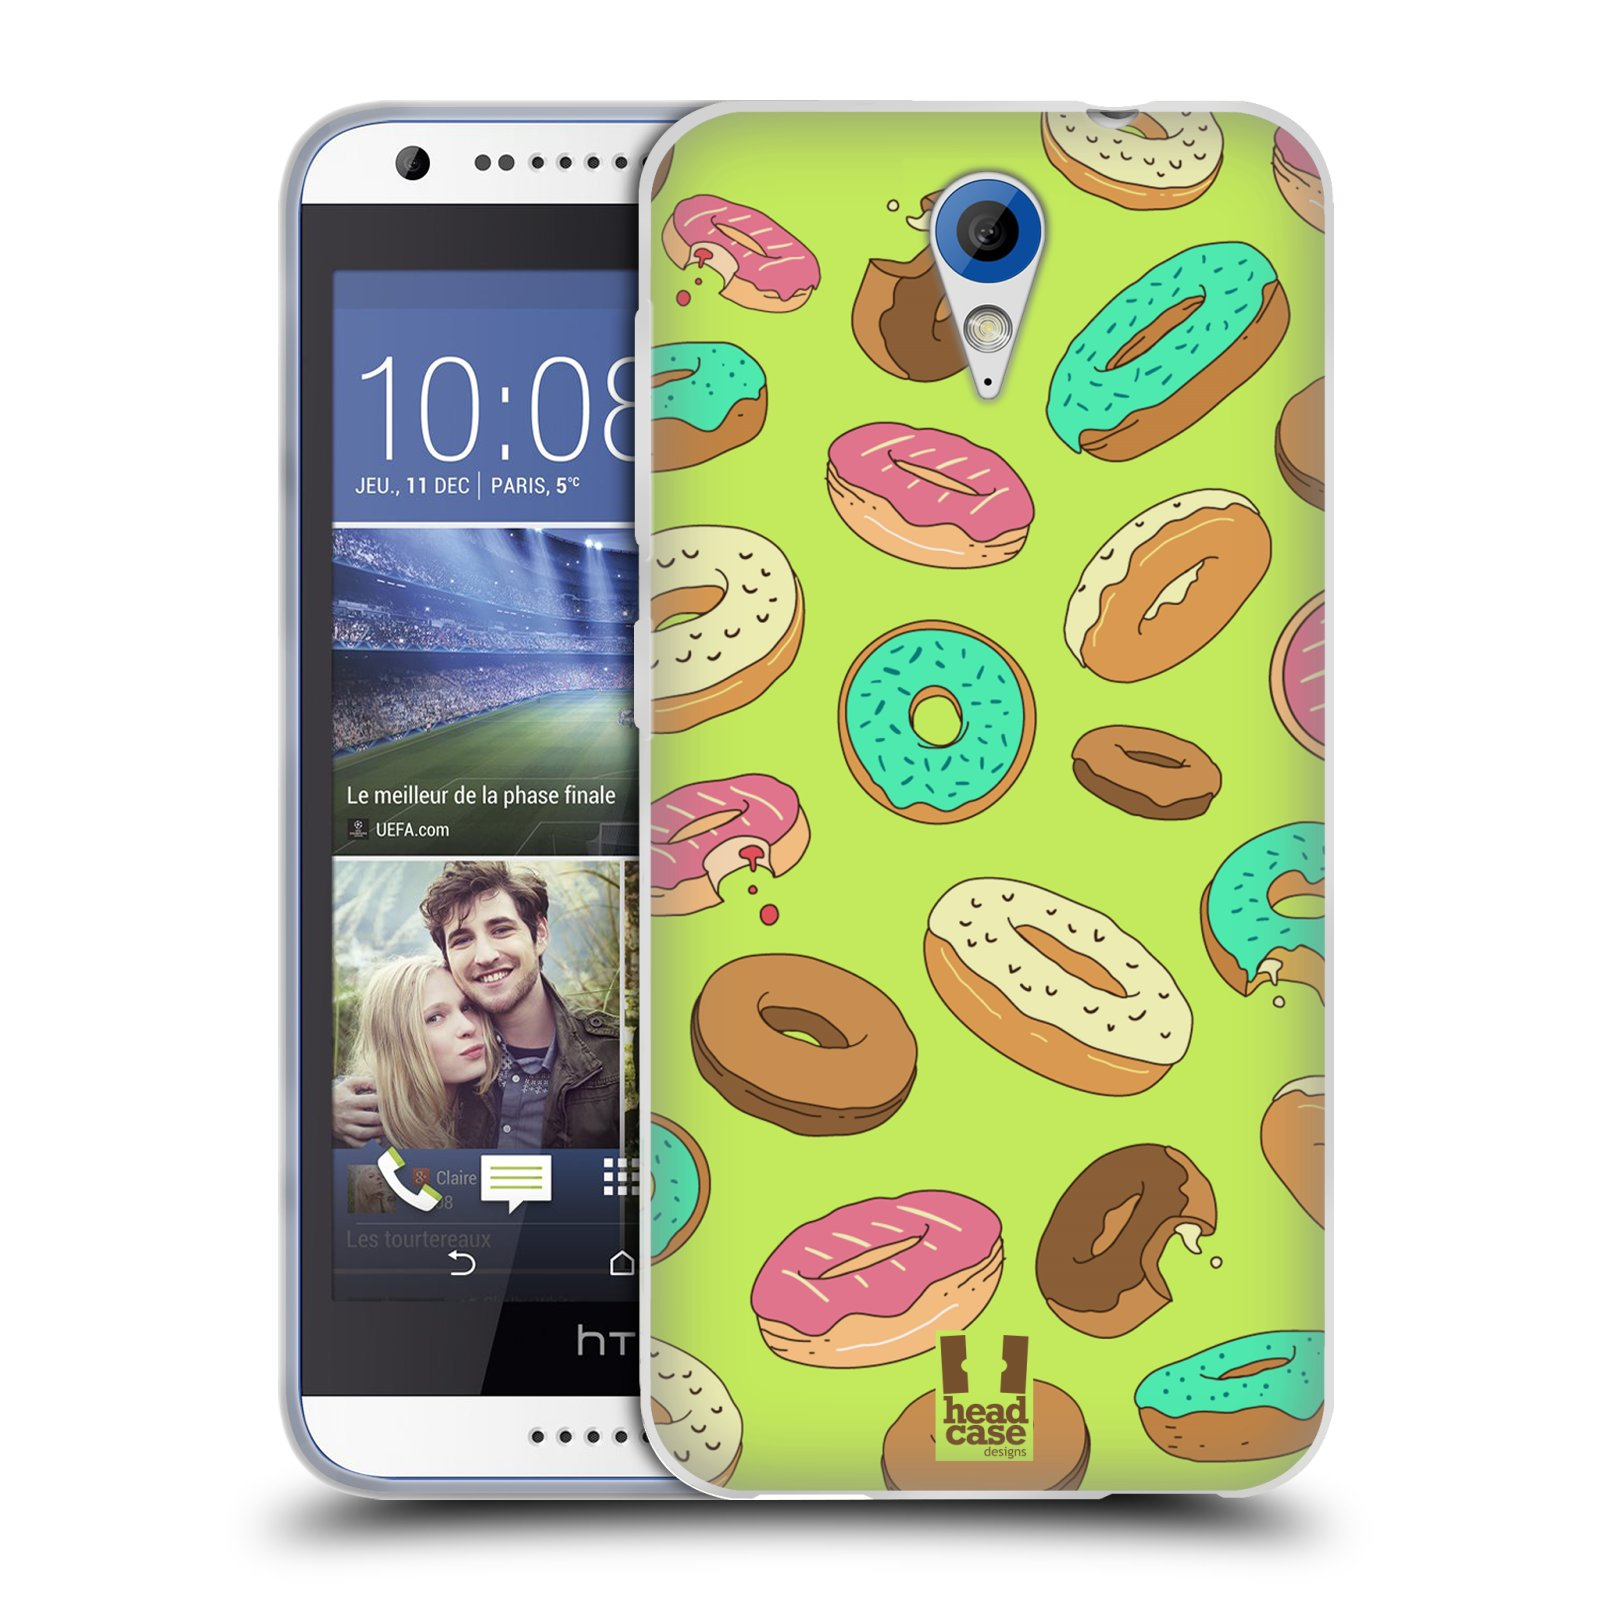 Silikonové pouzdro na mobil HTC Desire 620 HEAD CASE DONUTKY (Silikonový kryt či obal na mobilní telefon HTC Desire 620)